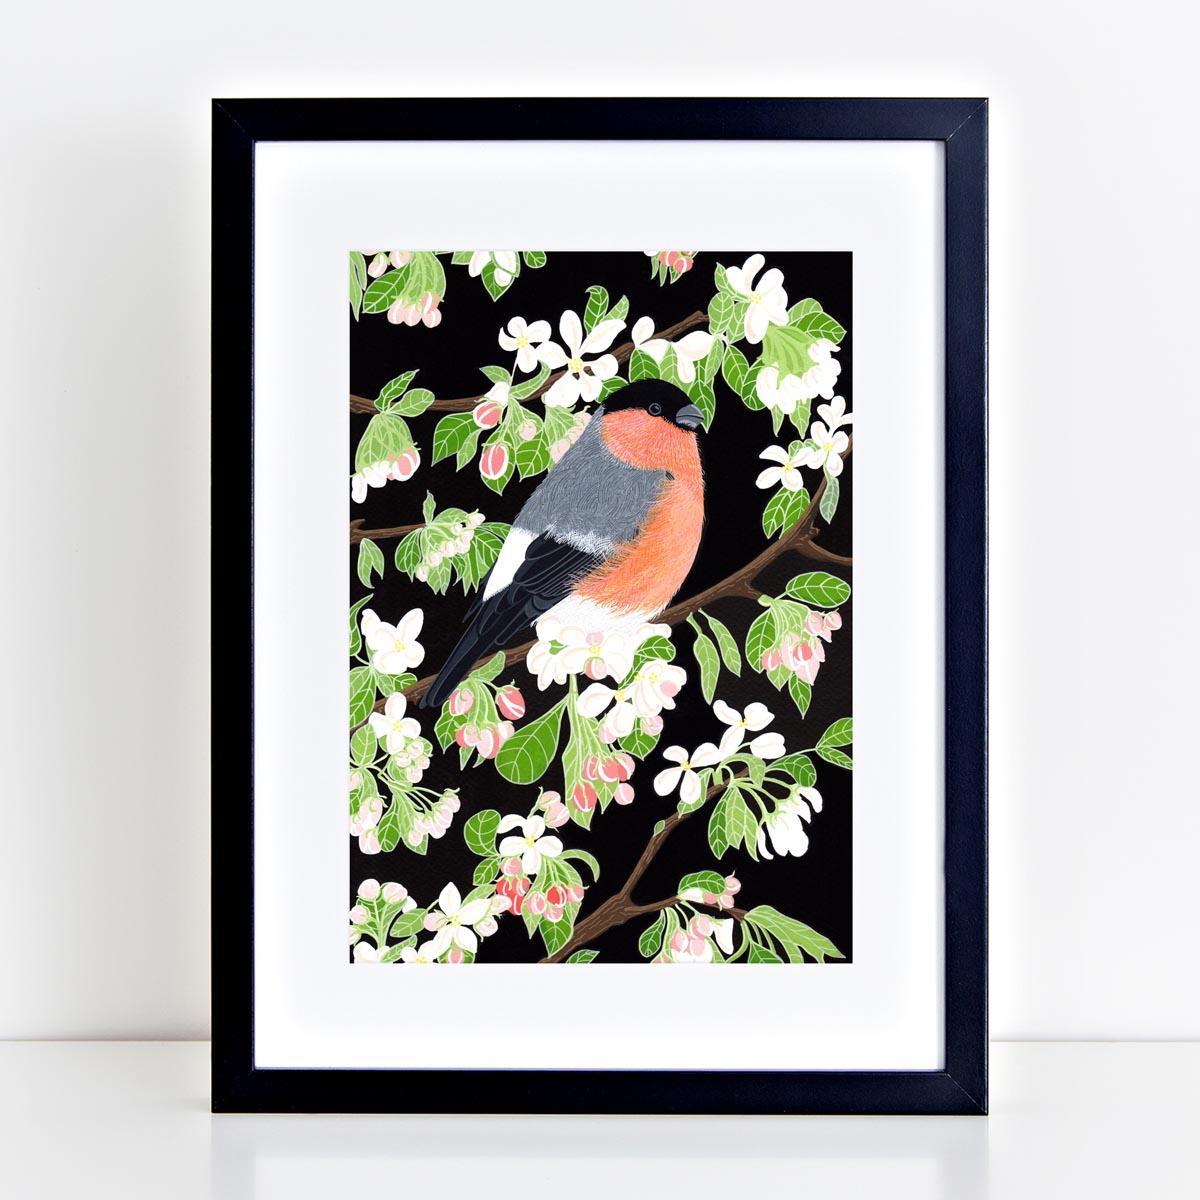 Bullfinch Print by Bird the Artist